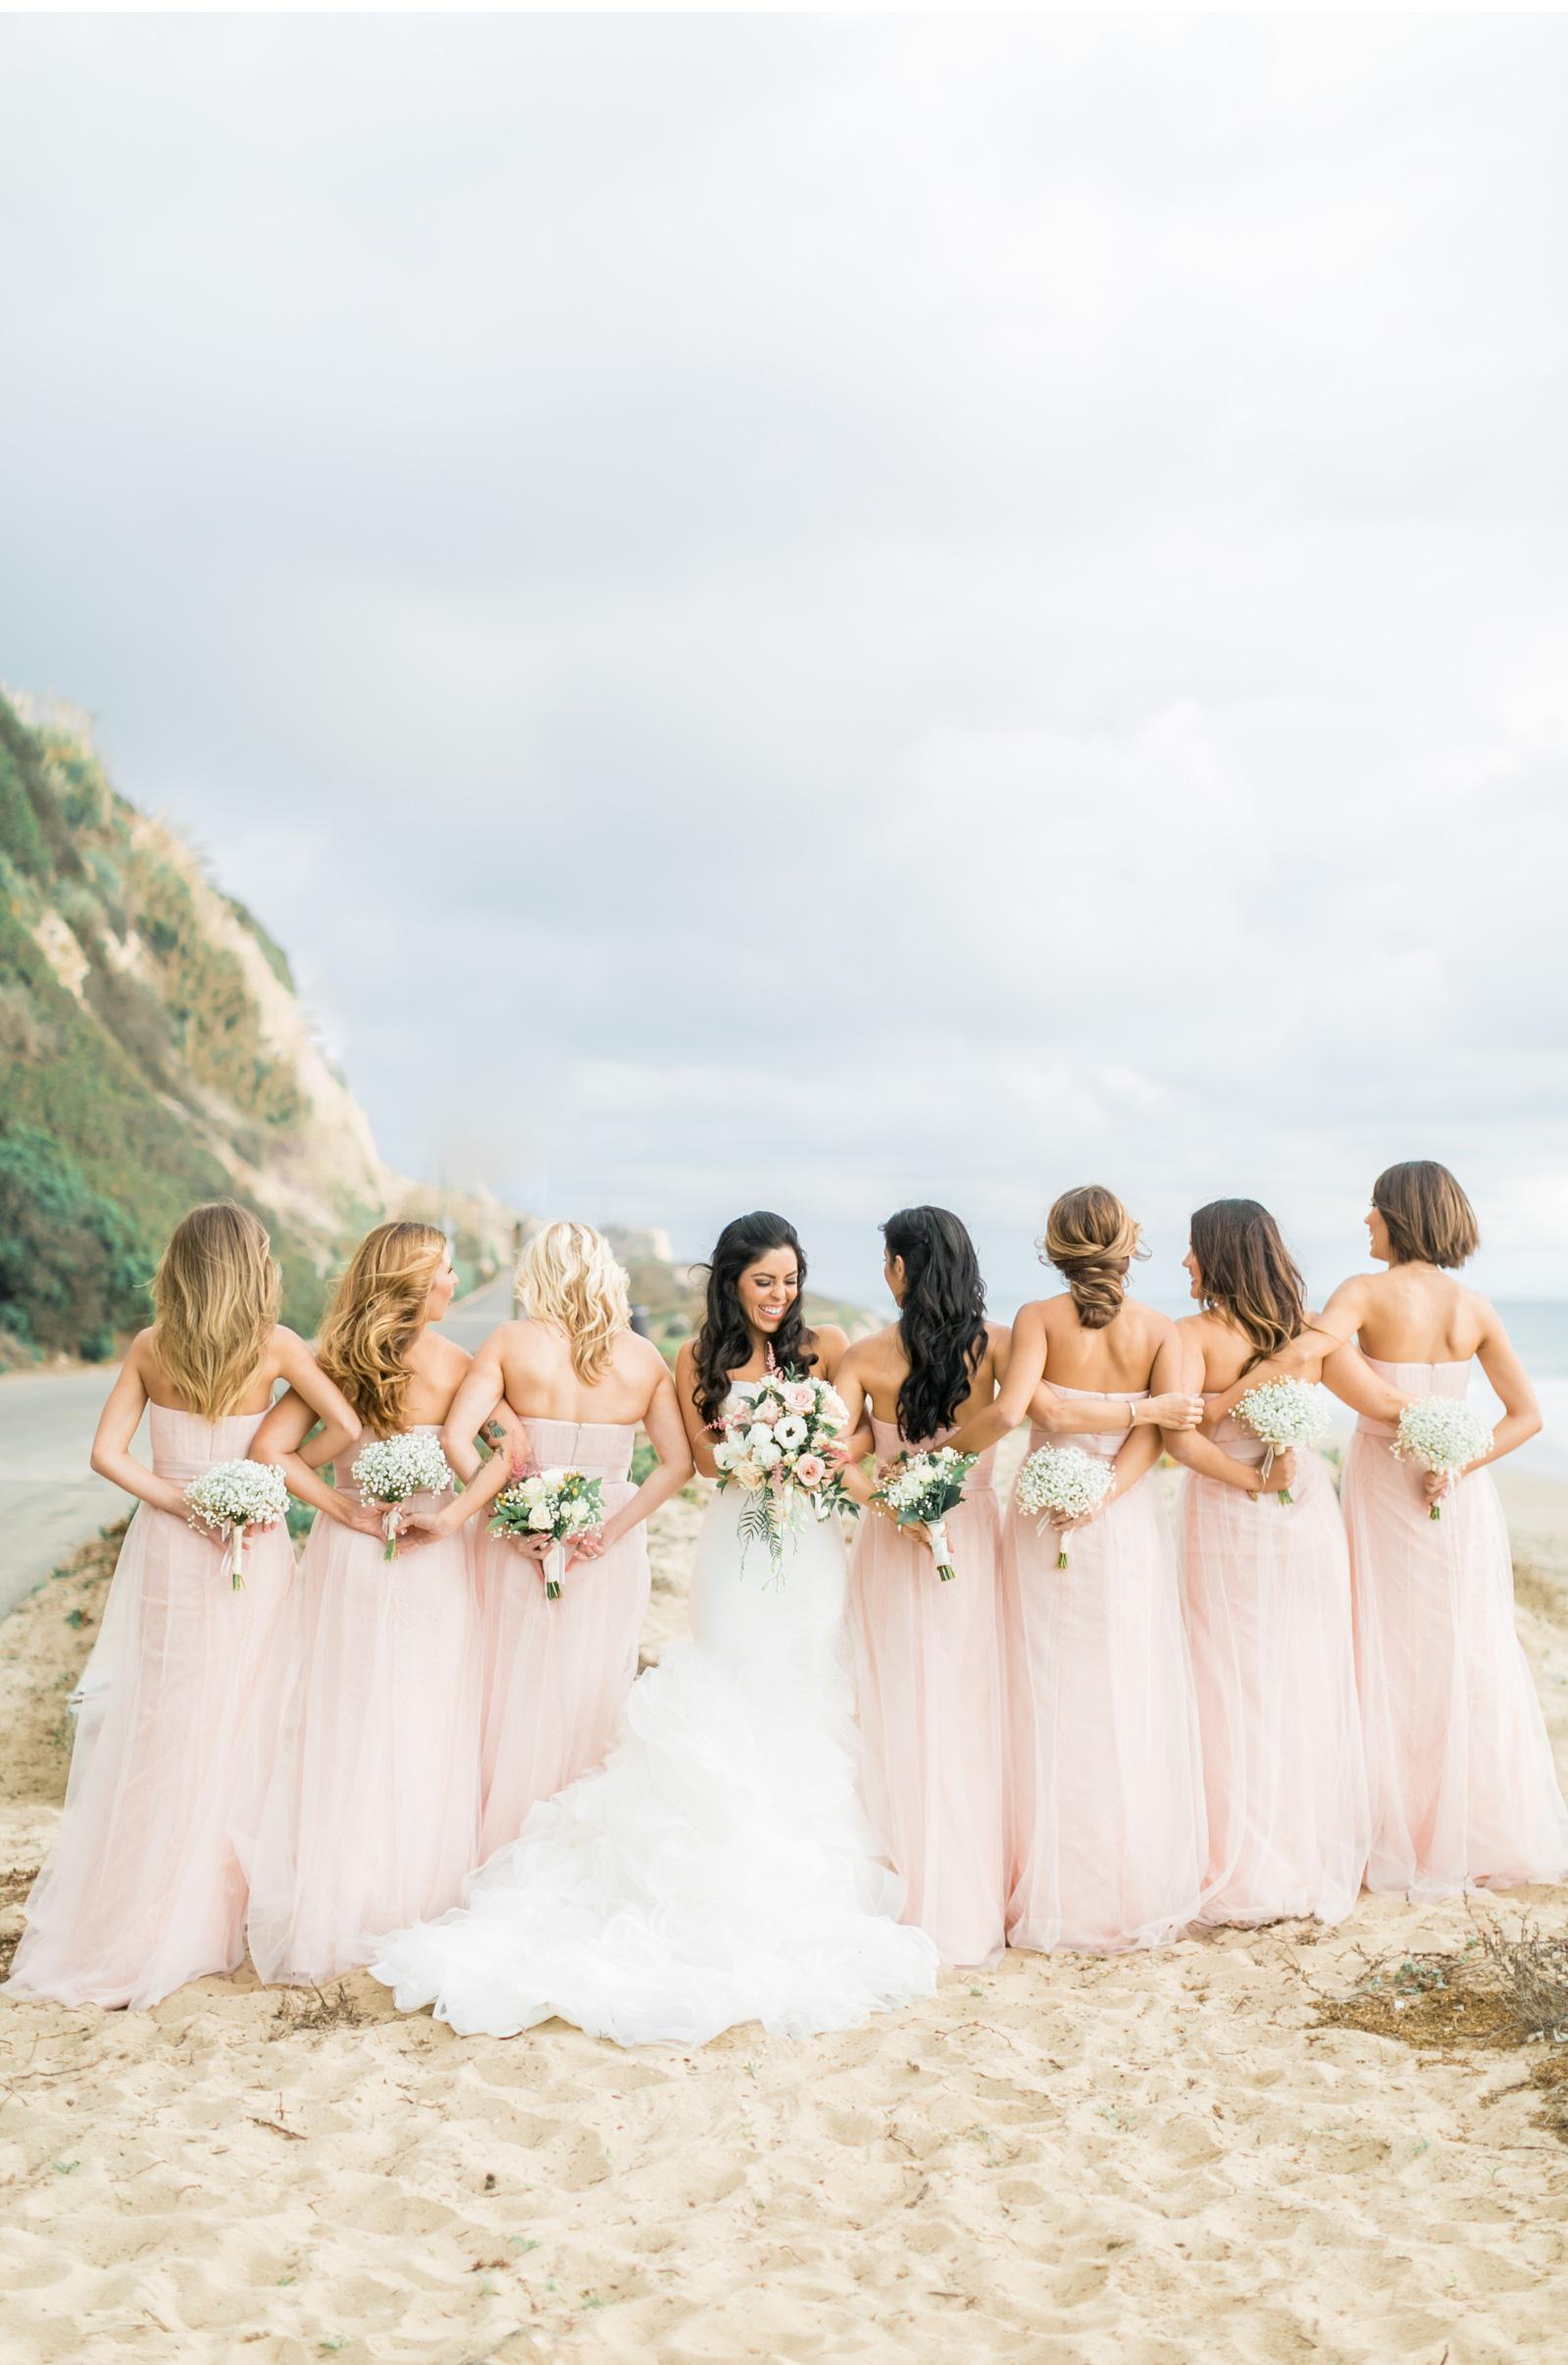 Rod-and-Lorin-Brewster-Style-Me-Pretty-Malibu-Beach-Wedding-Natalie-Schutt-Photography_09.jpg